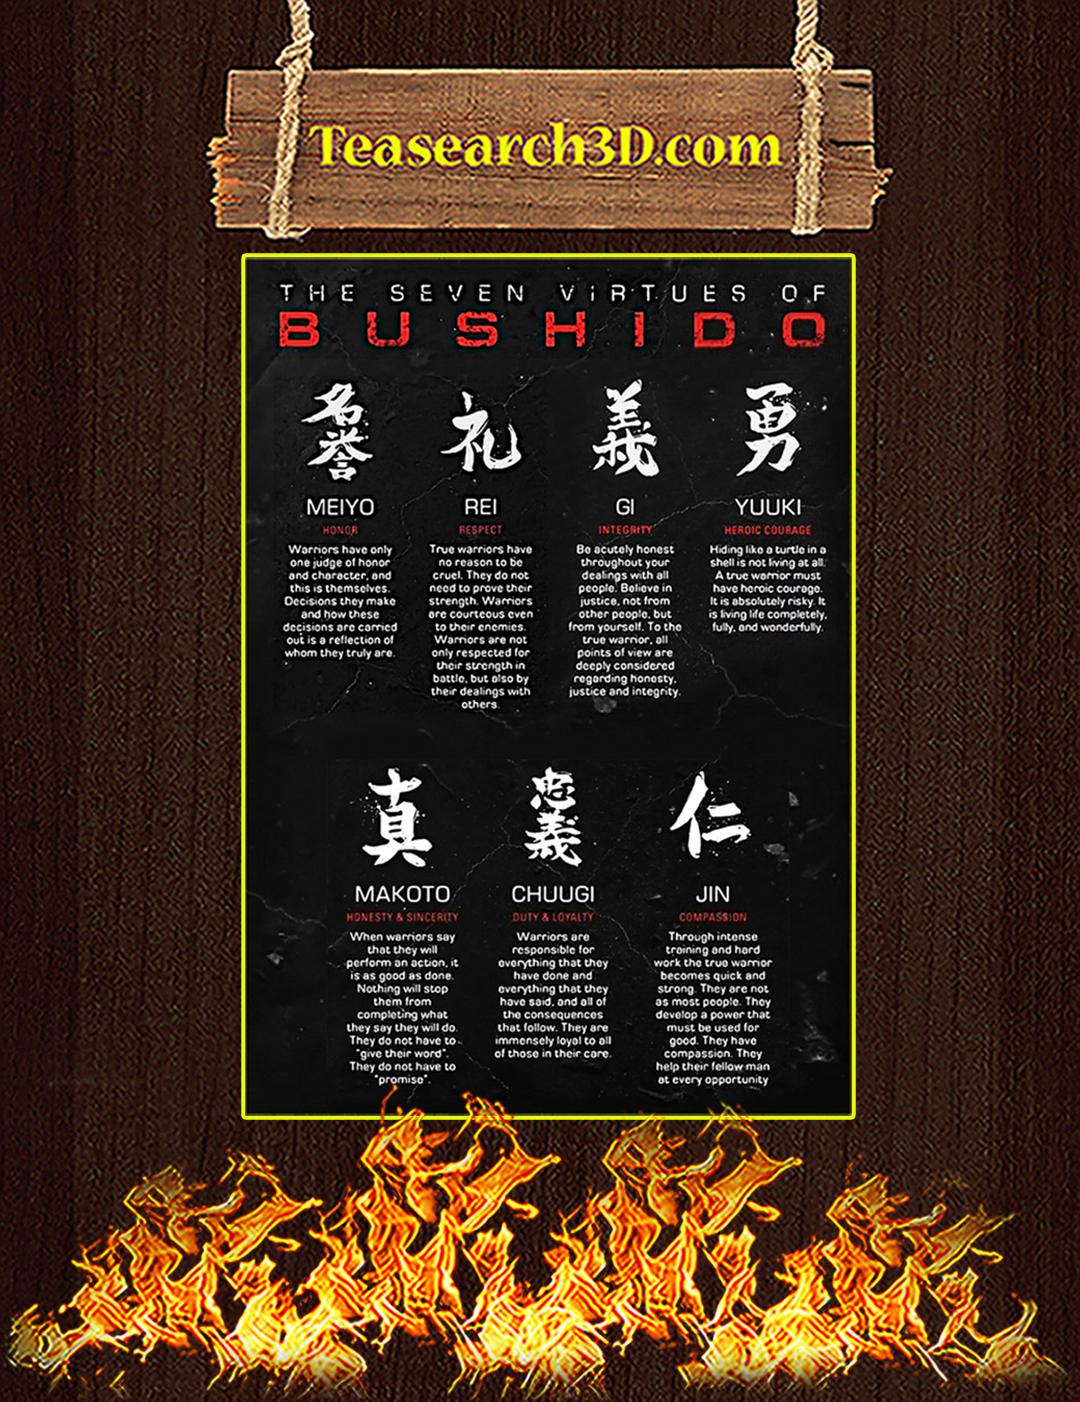 The Seven Virtues Of Bushido Samurai Poster A2